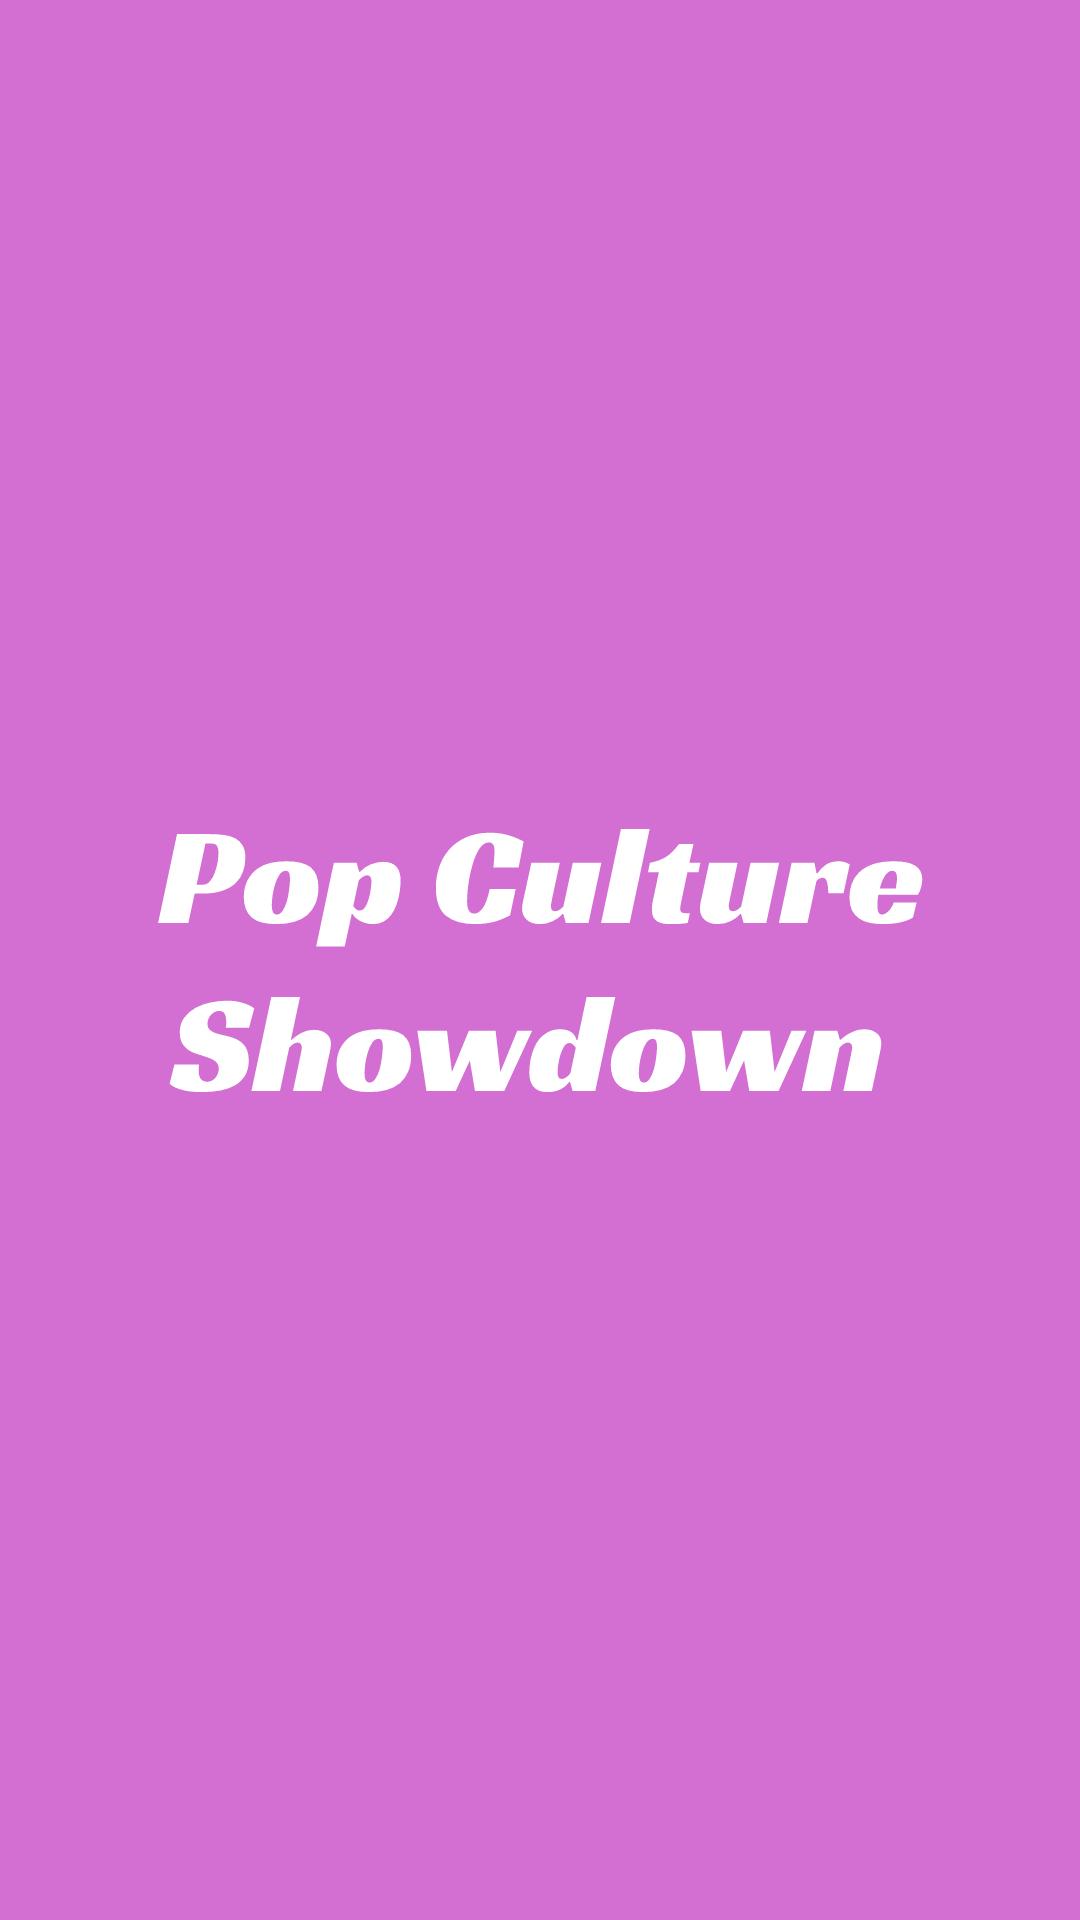 Pop Culture Showdown